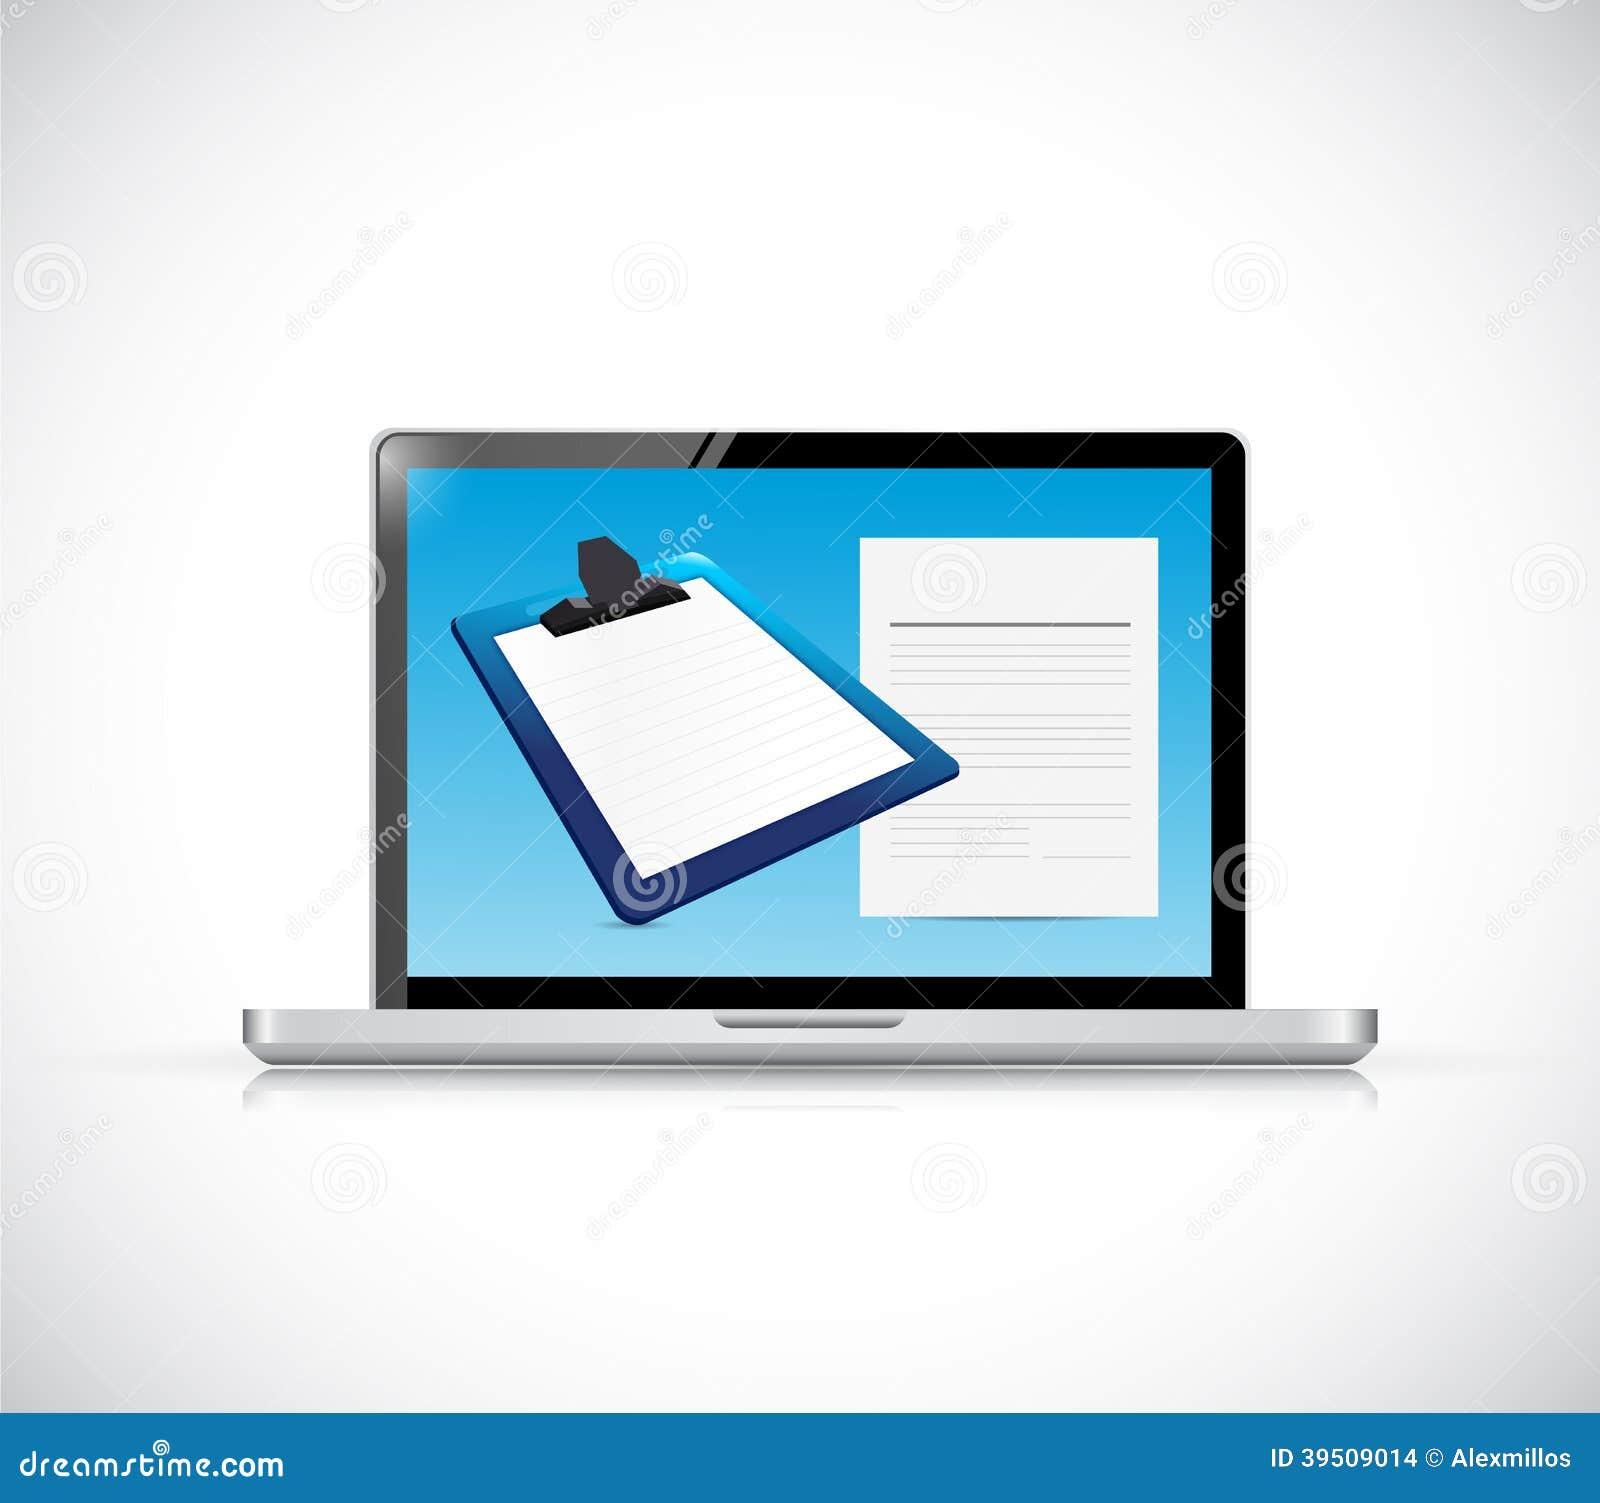 Laptop and clipboard illustration design